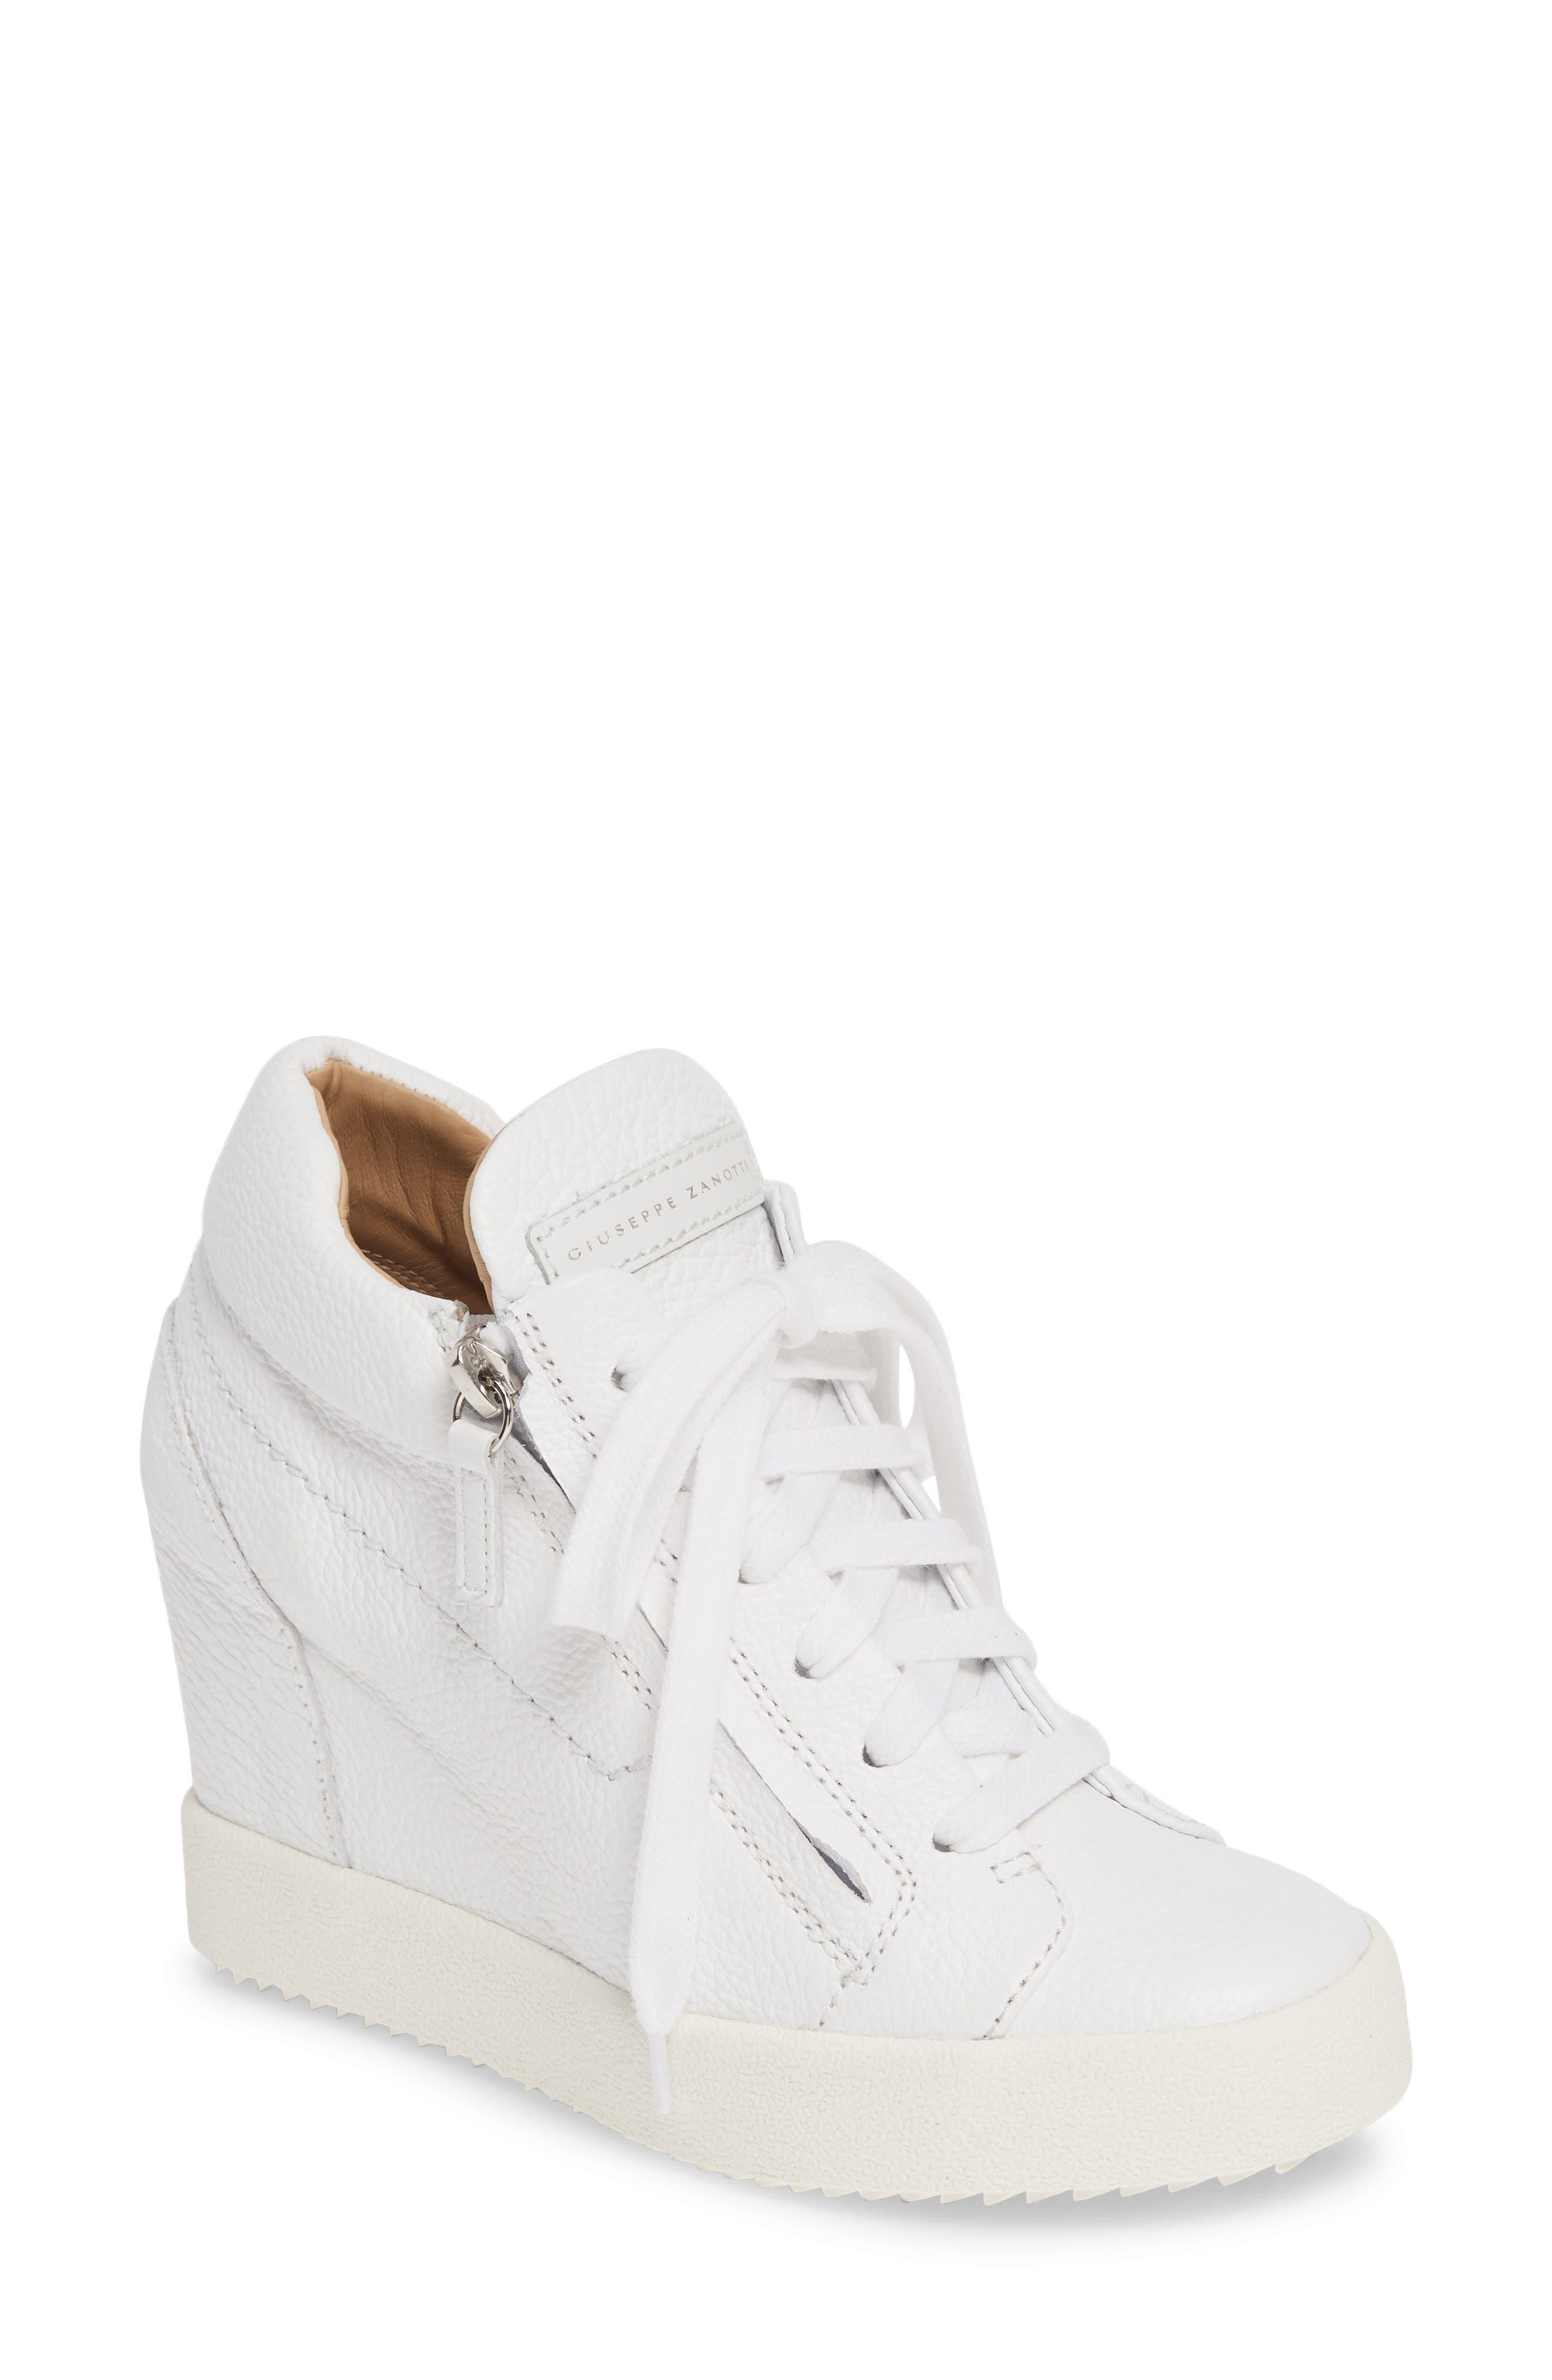 white platform sneakers designer